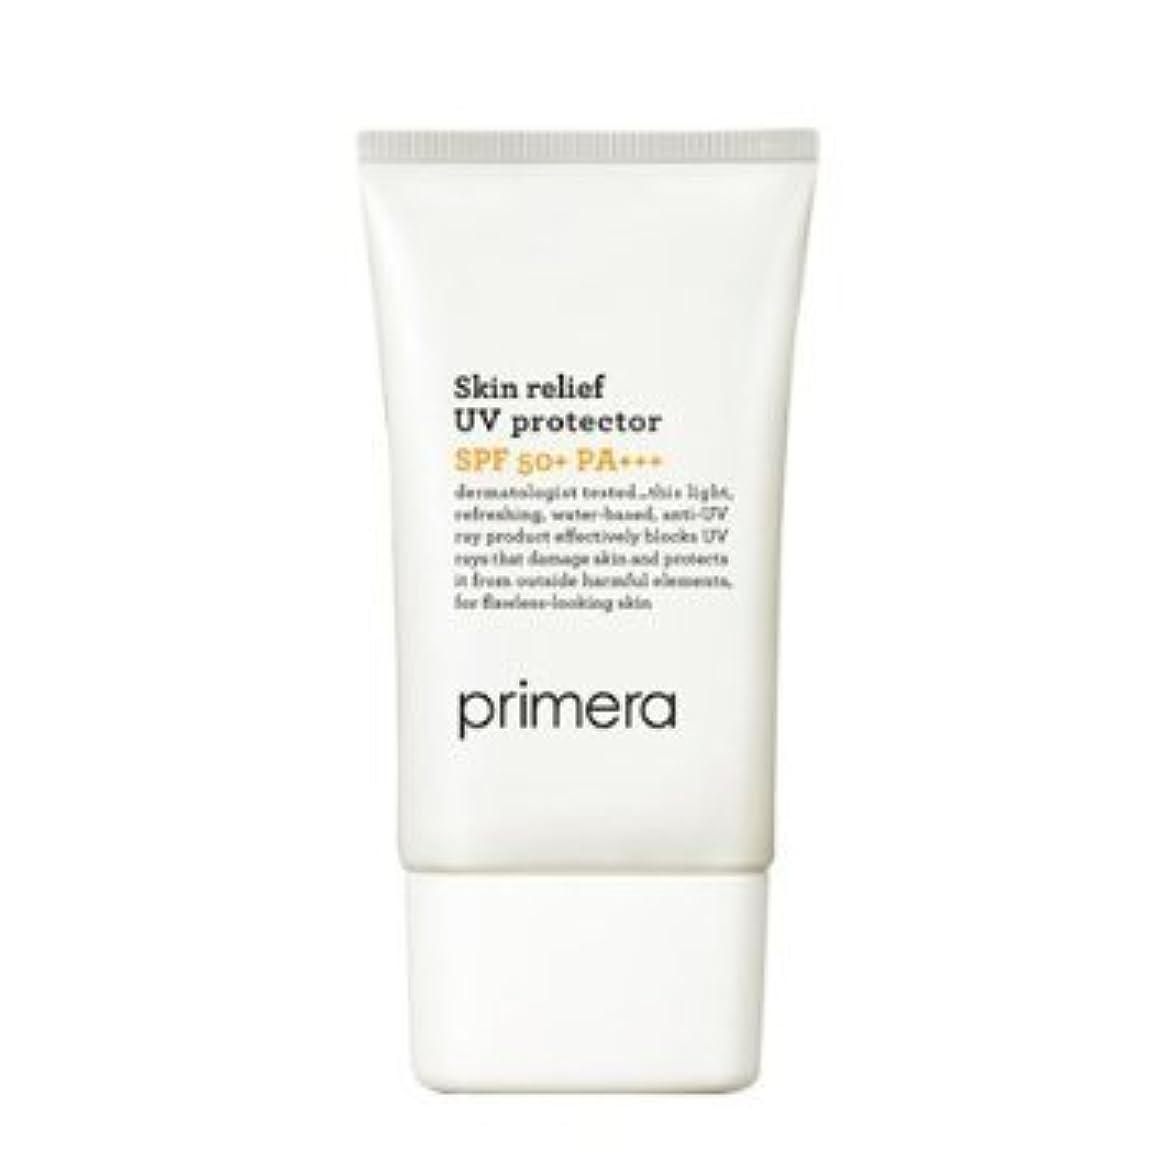 Korean Cosmetics, Amorepacific Primera Skin Relief UV Protector SPF50+ PA+++ 50ml[行輸入品]